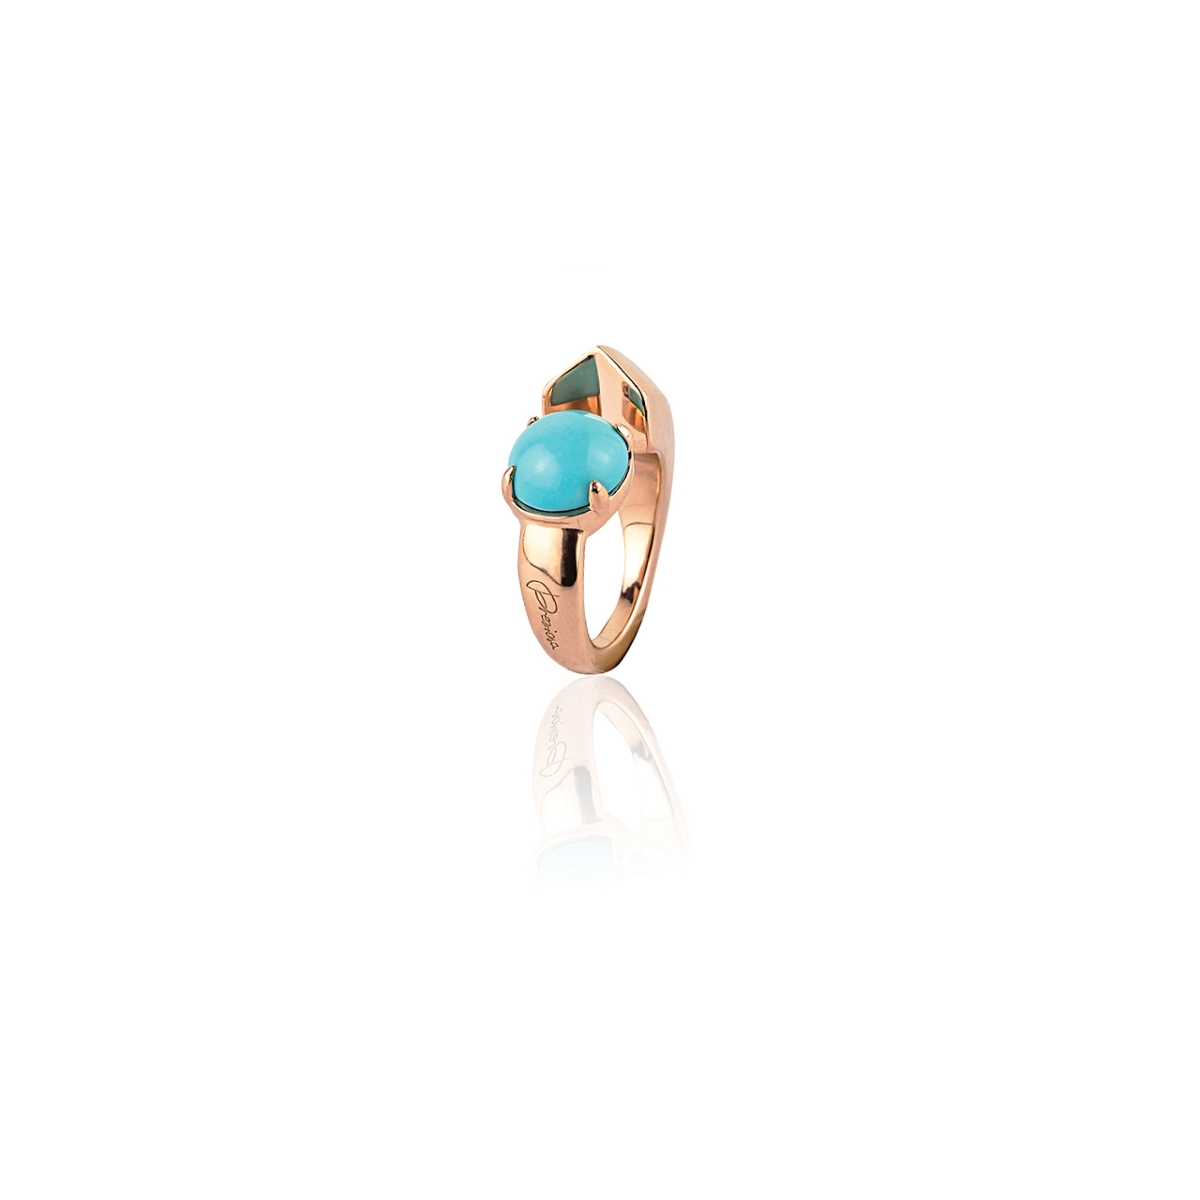 Preziosa gioielli alejandra turchese